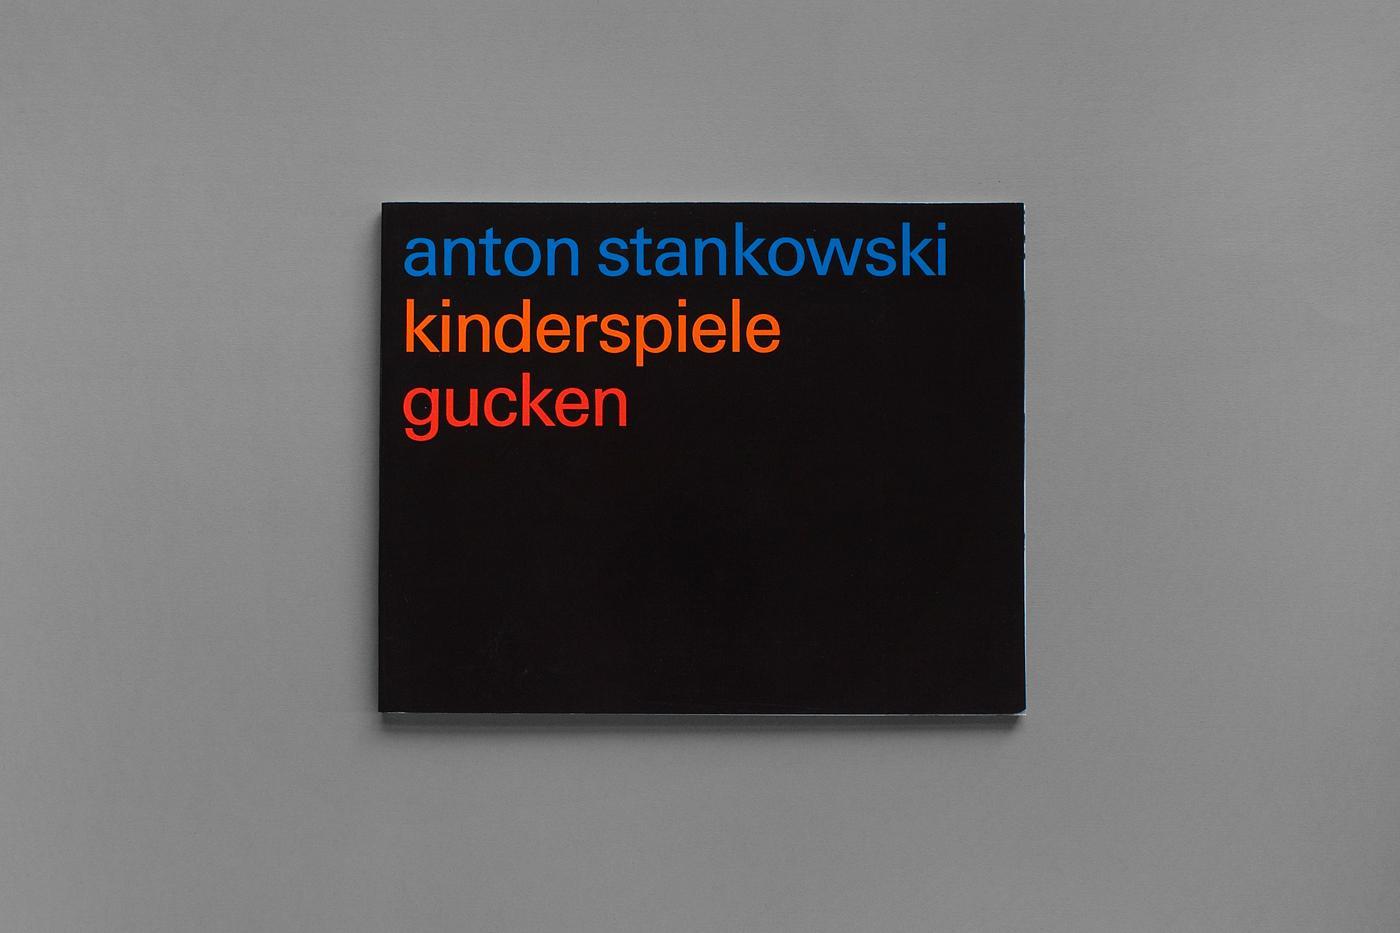 Anton Stankowski: Kinderspiele